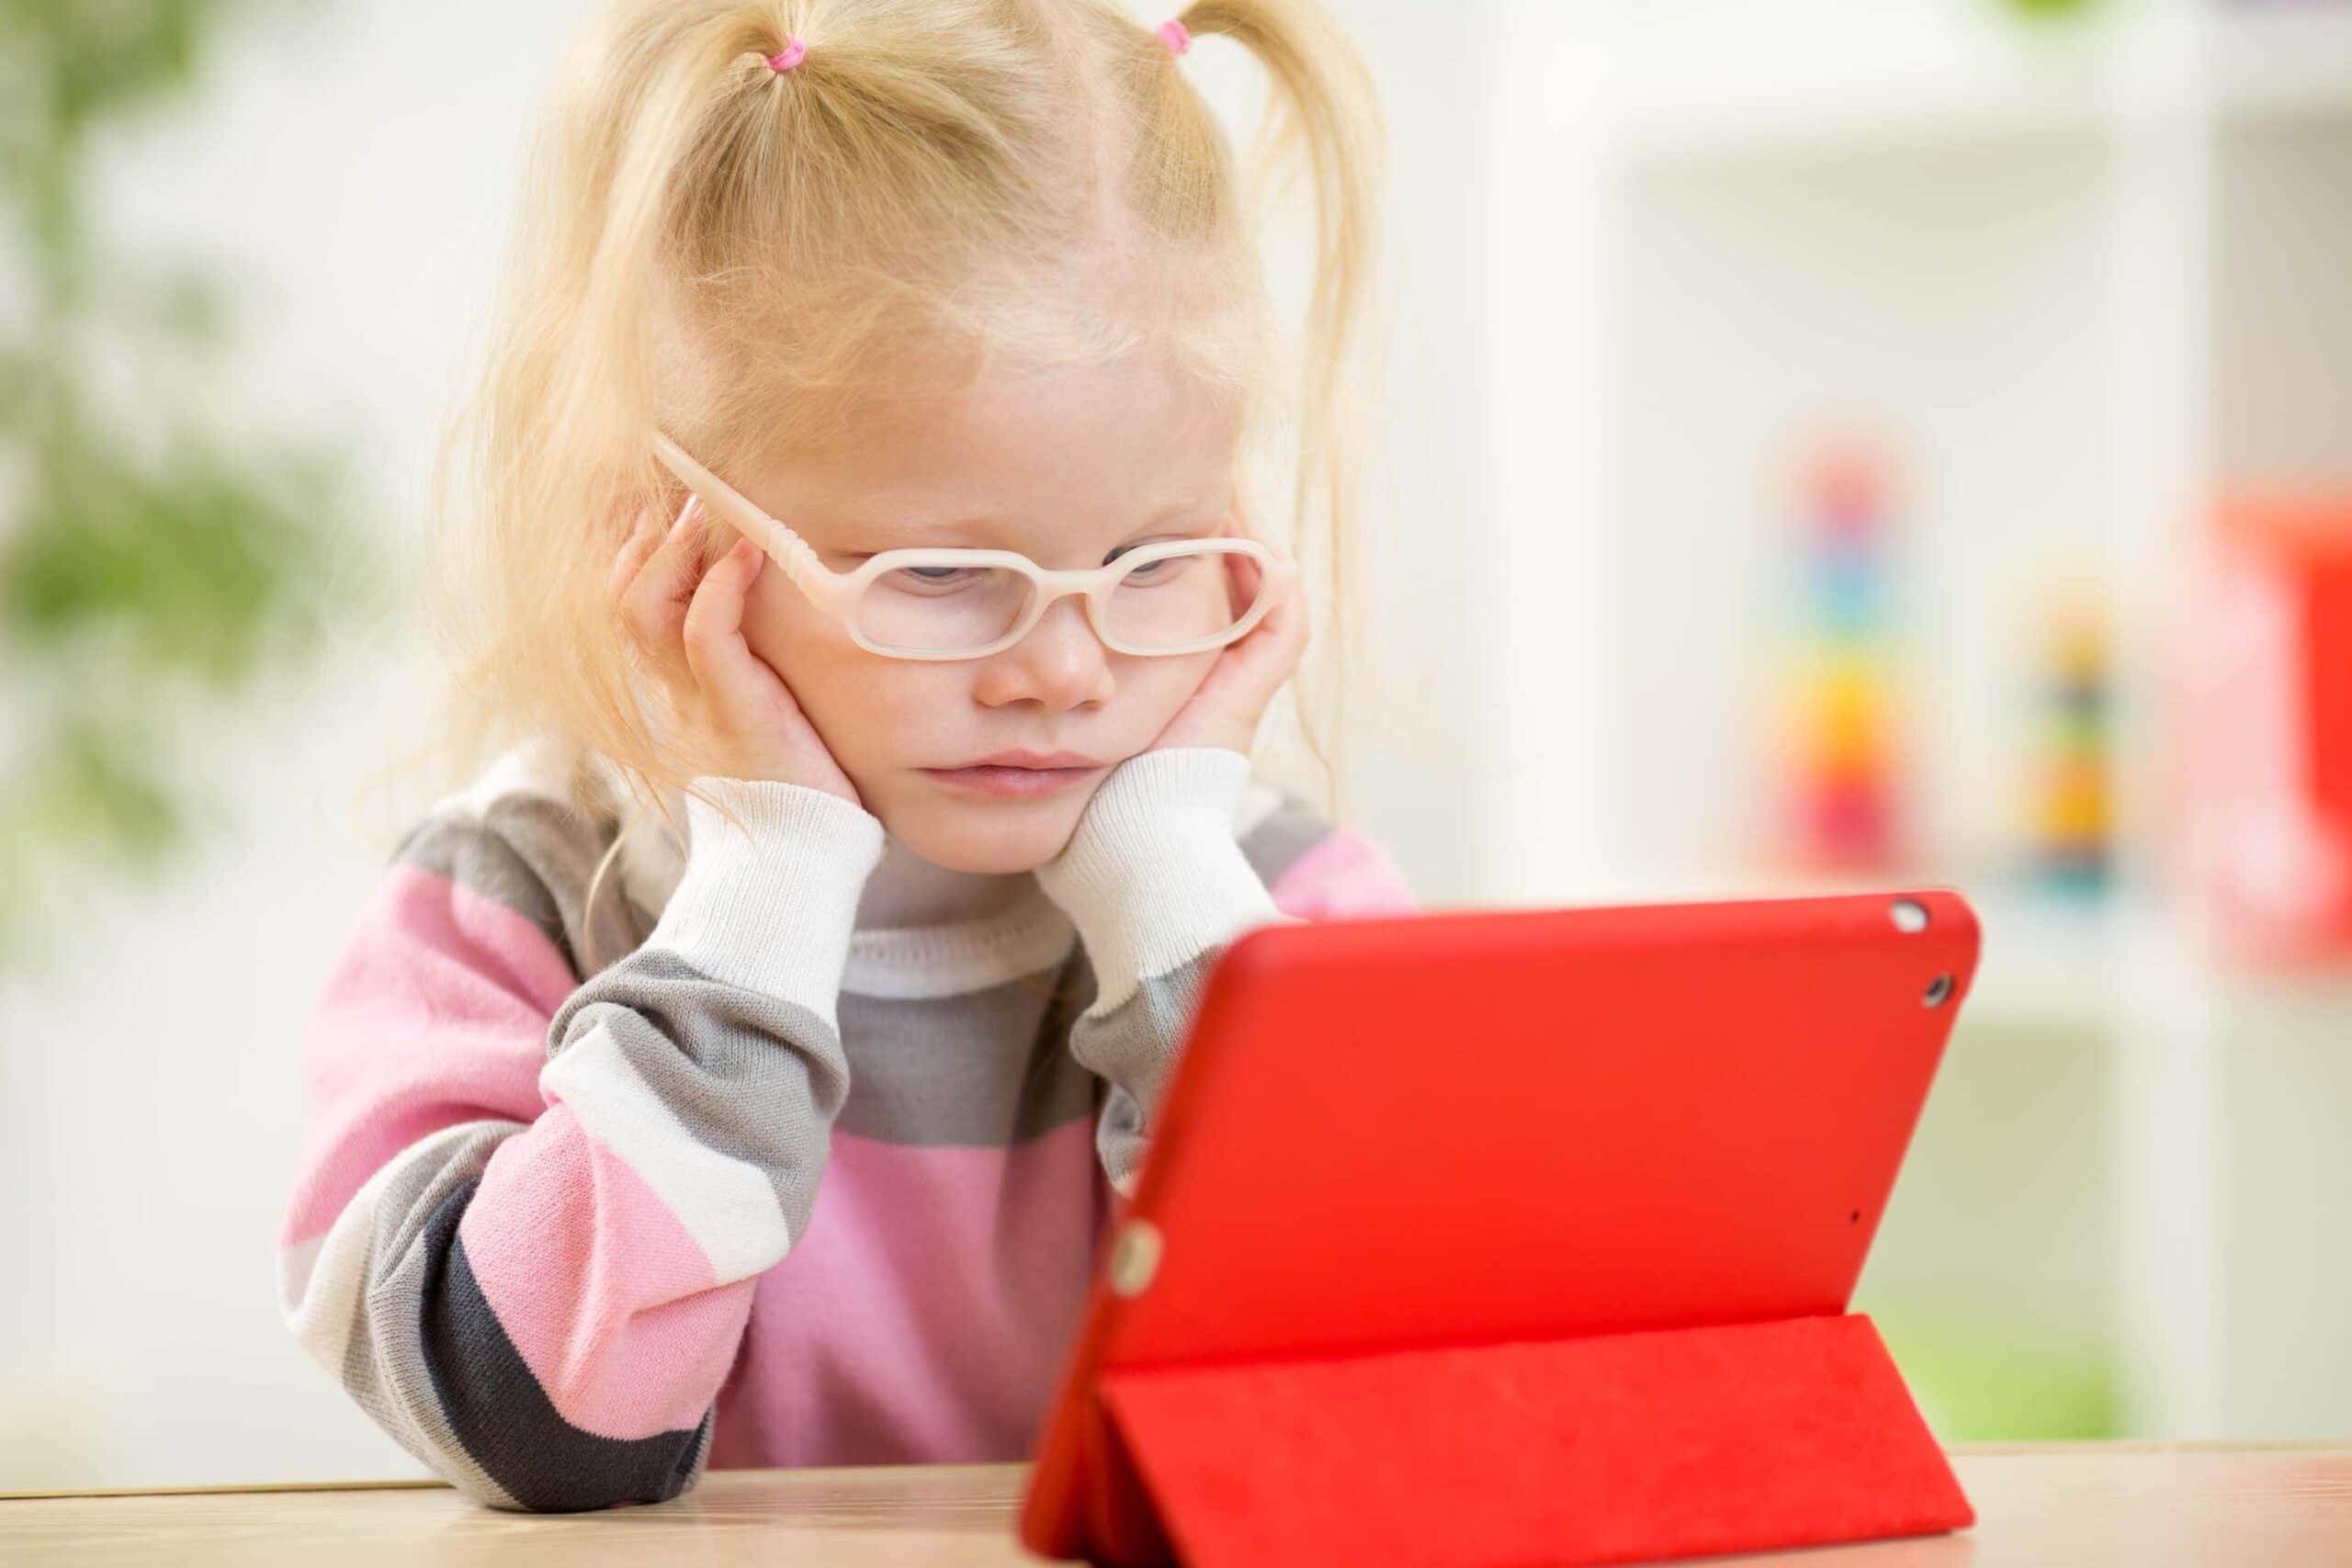 Short-Sightedness In Children